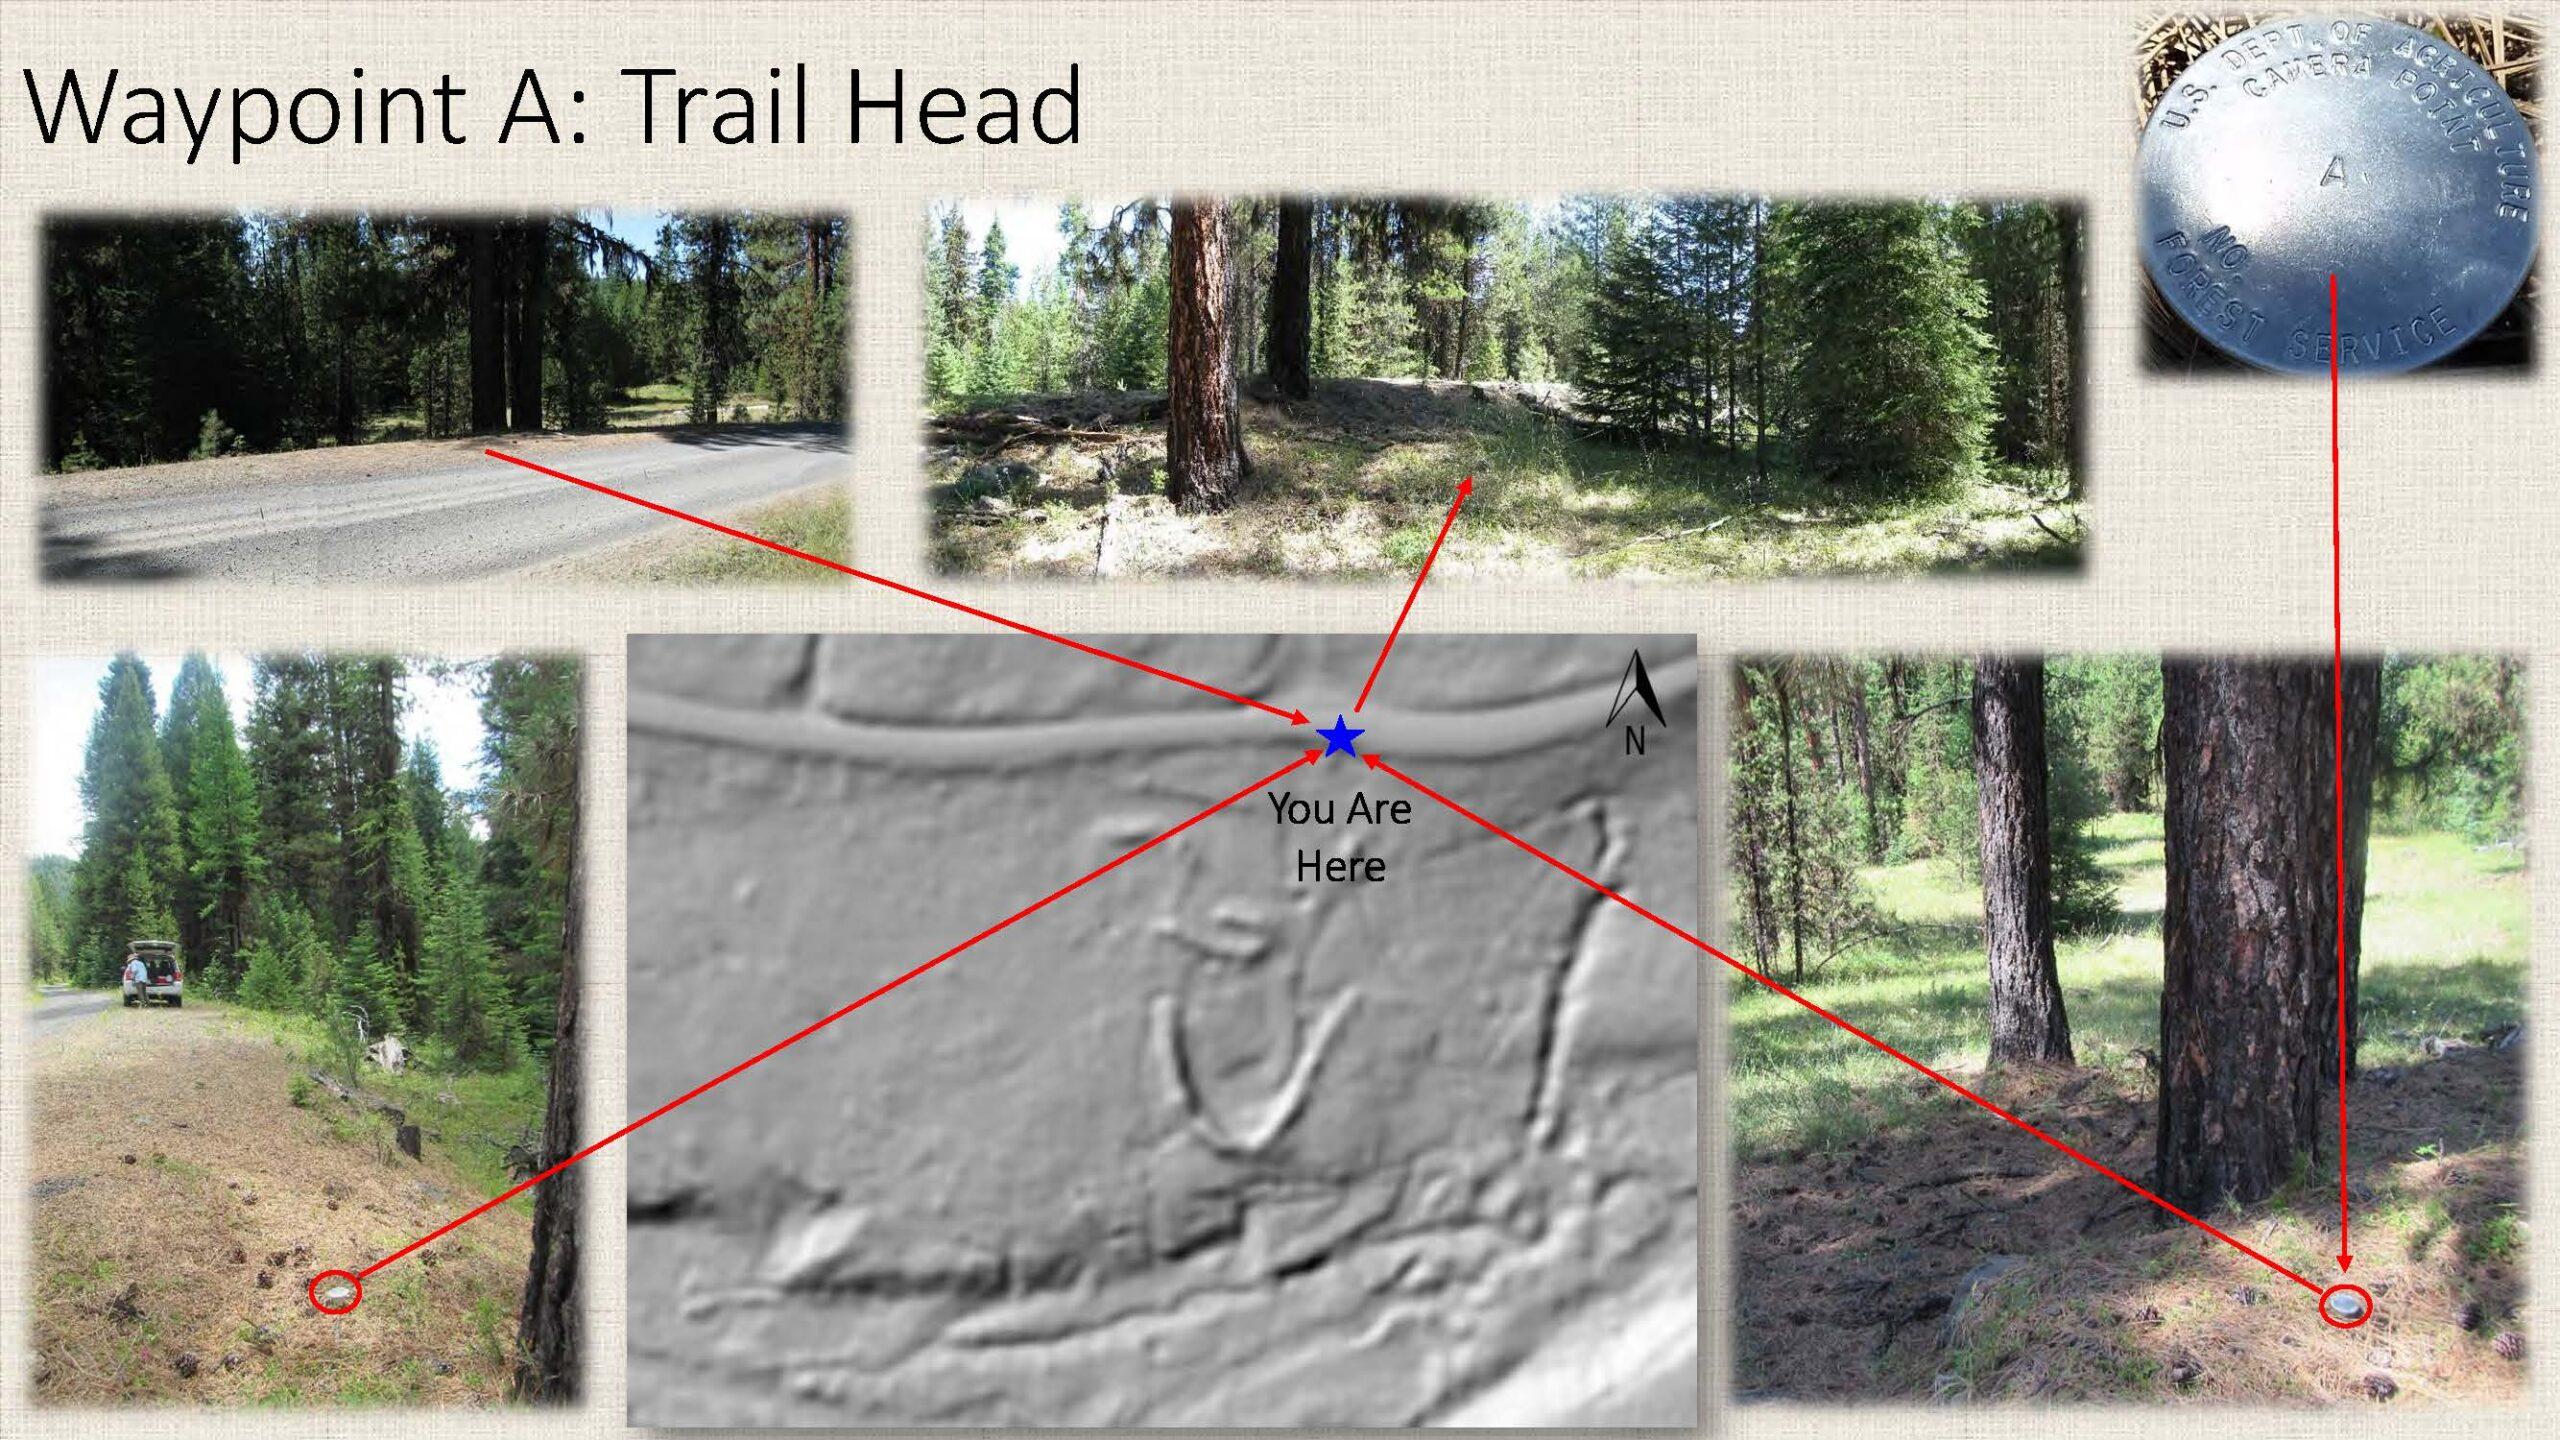 Waypoint A: Trail Head